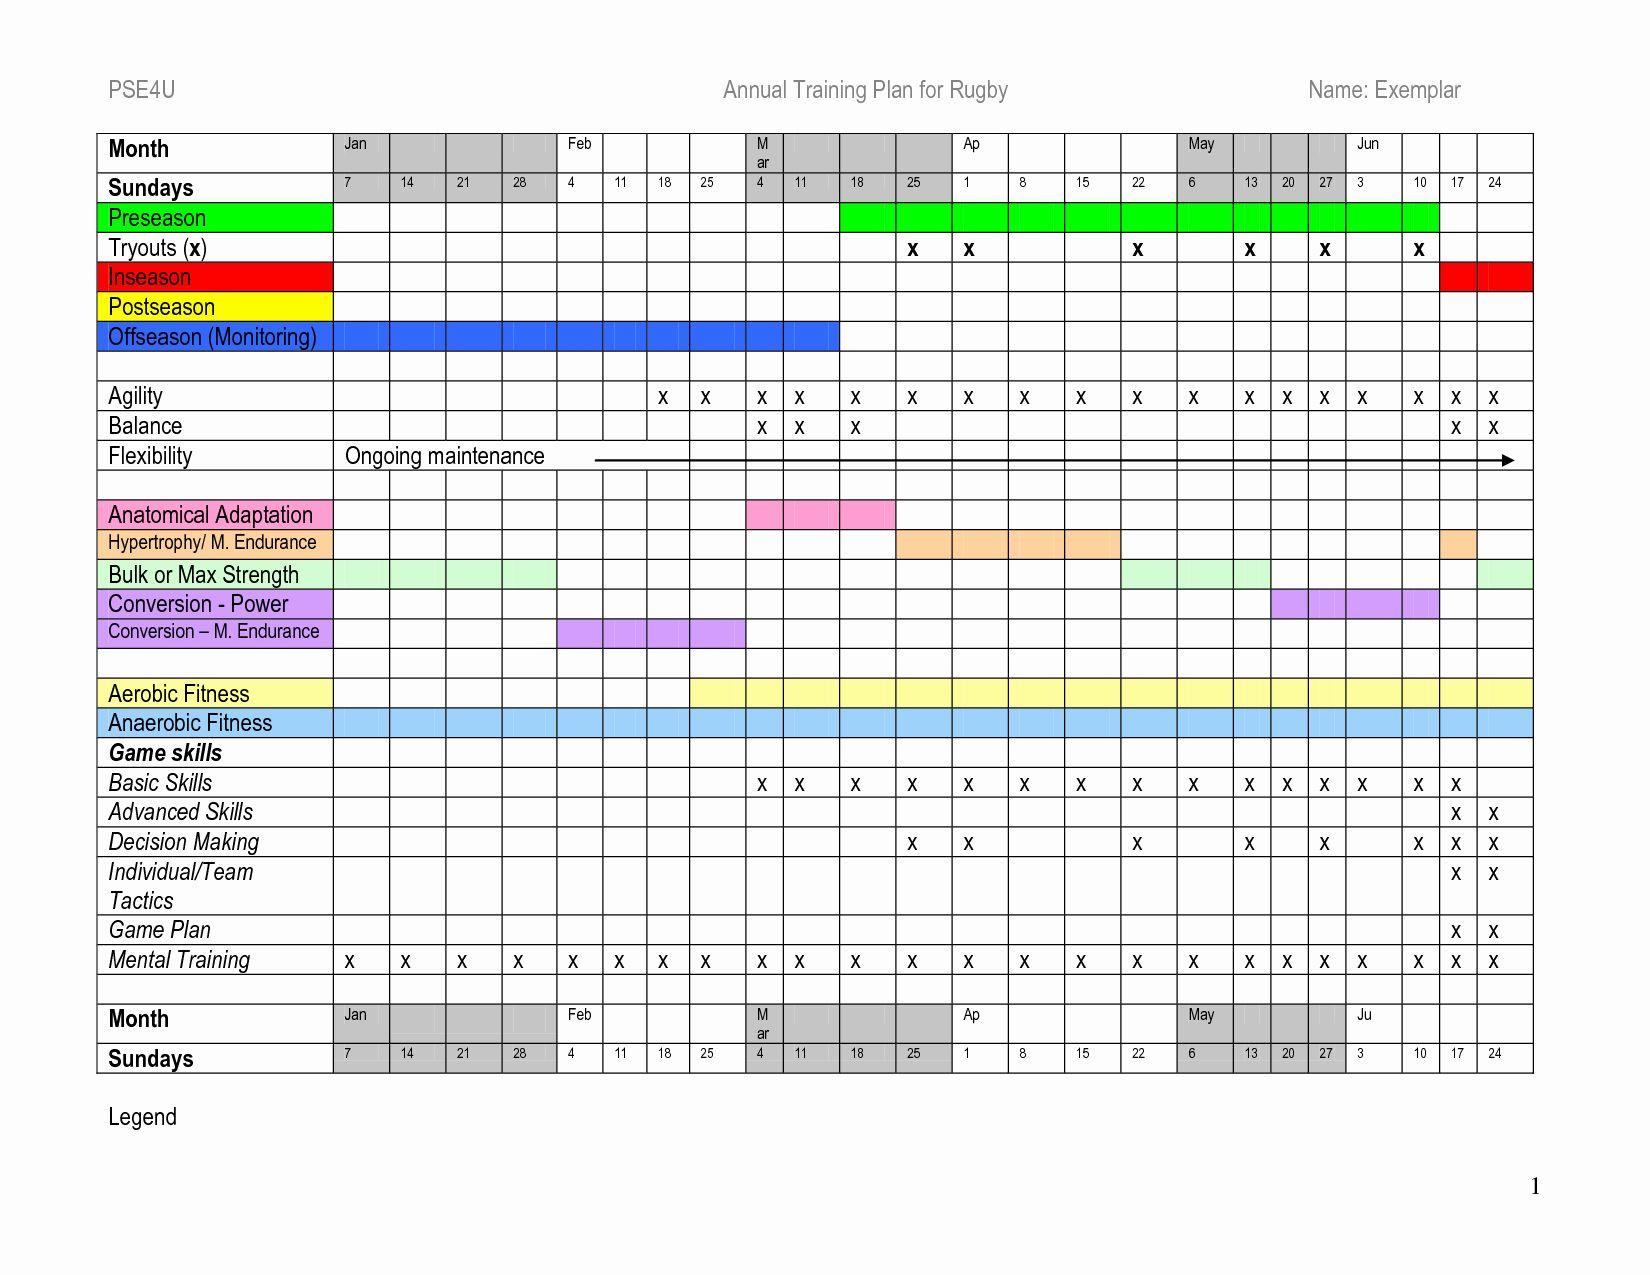 Free Employee Training Matrix Template Excel New Employee Training Schedule Template Vlashed Workout Plan Template Employee Training Training Schedule